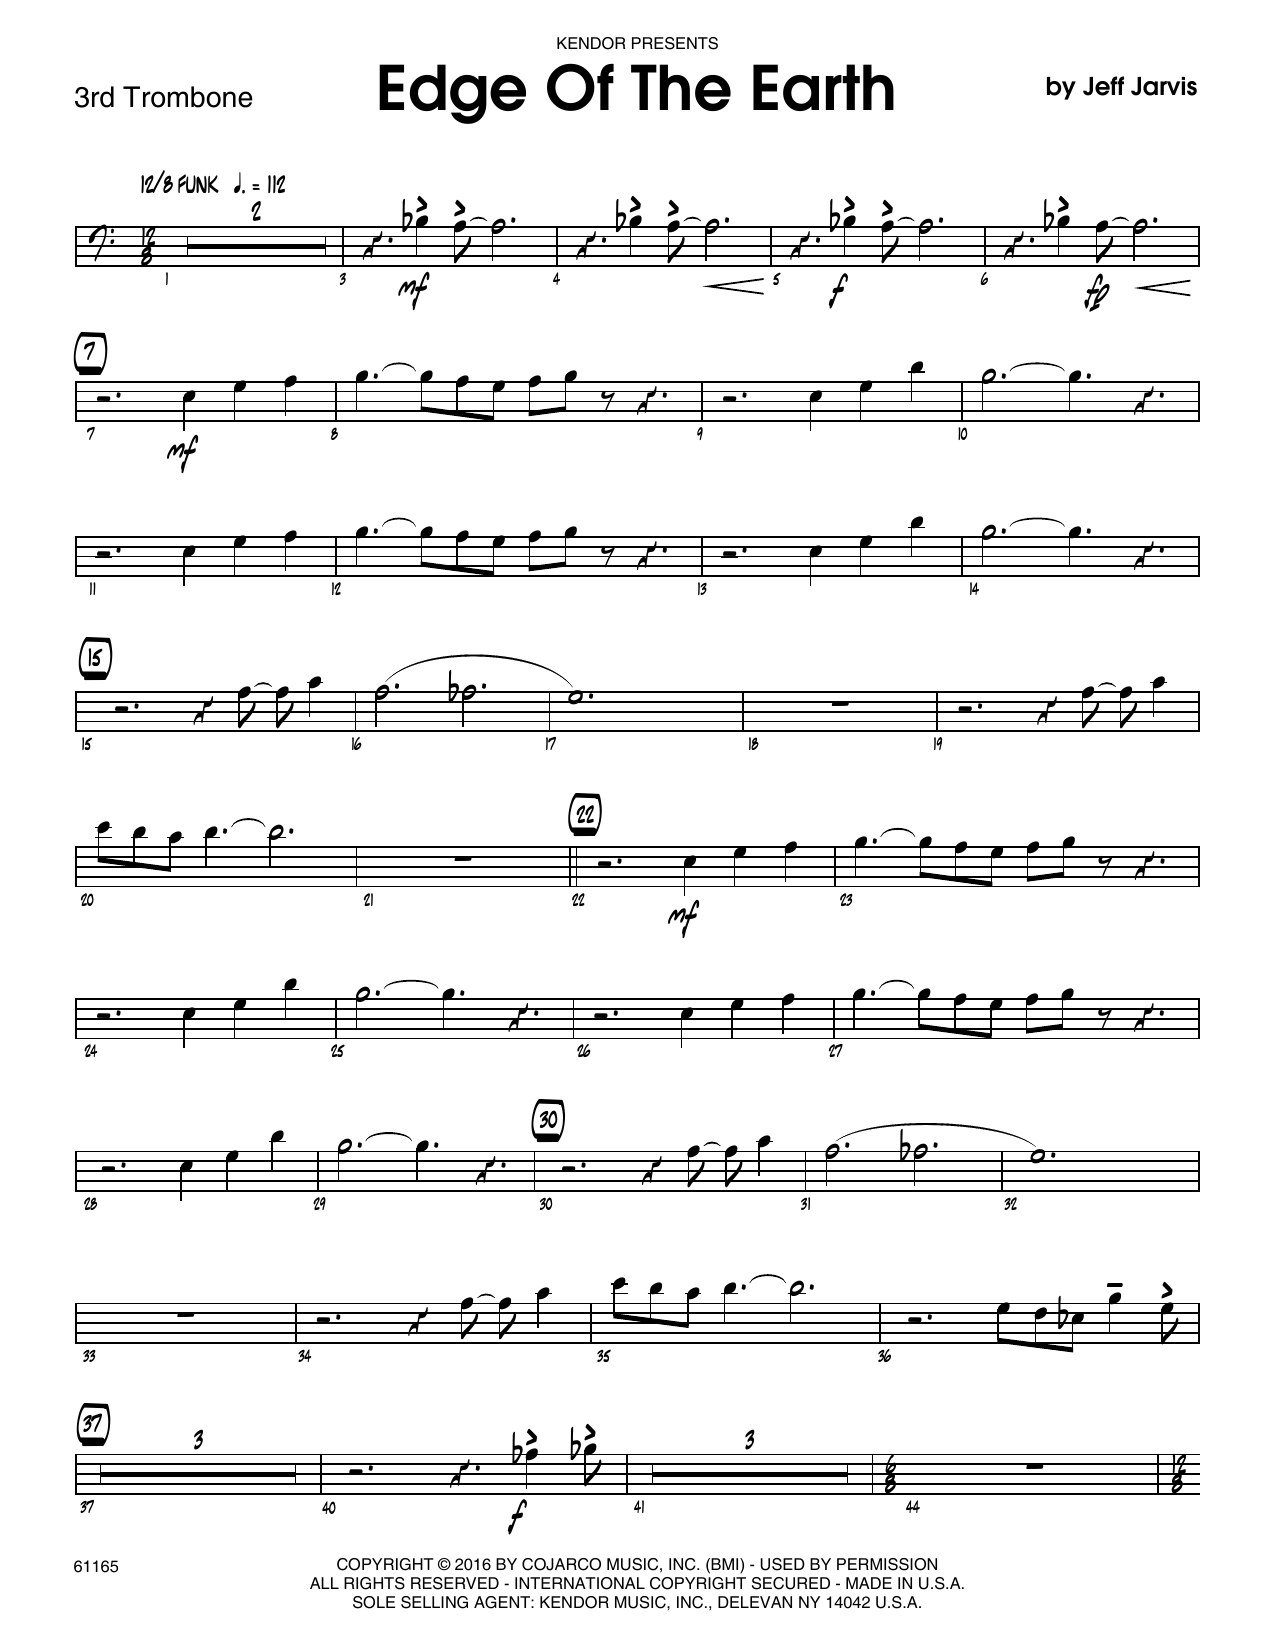 Edge Of The Earth - 3rd Trombone Sheet Music